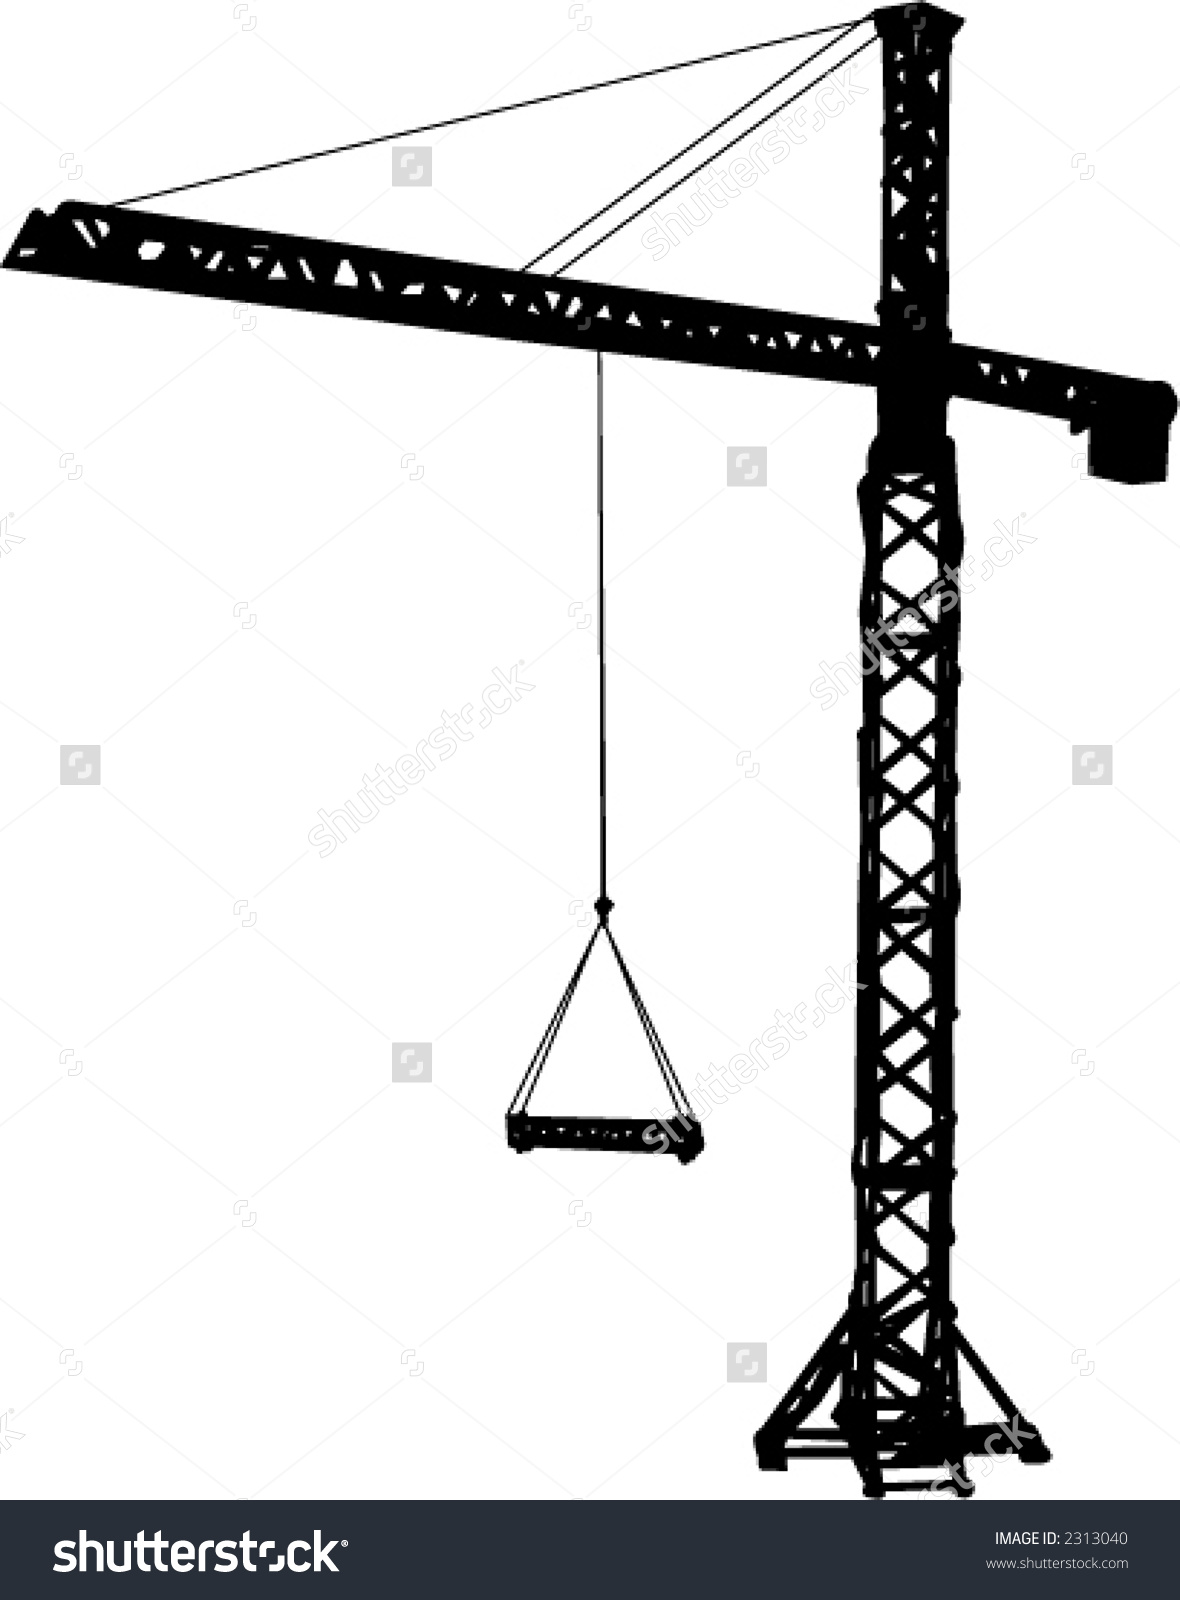 Tower crane clipart.